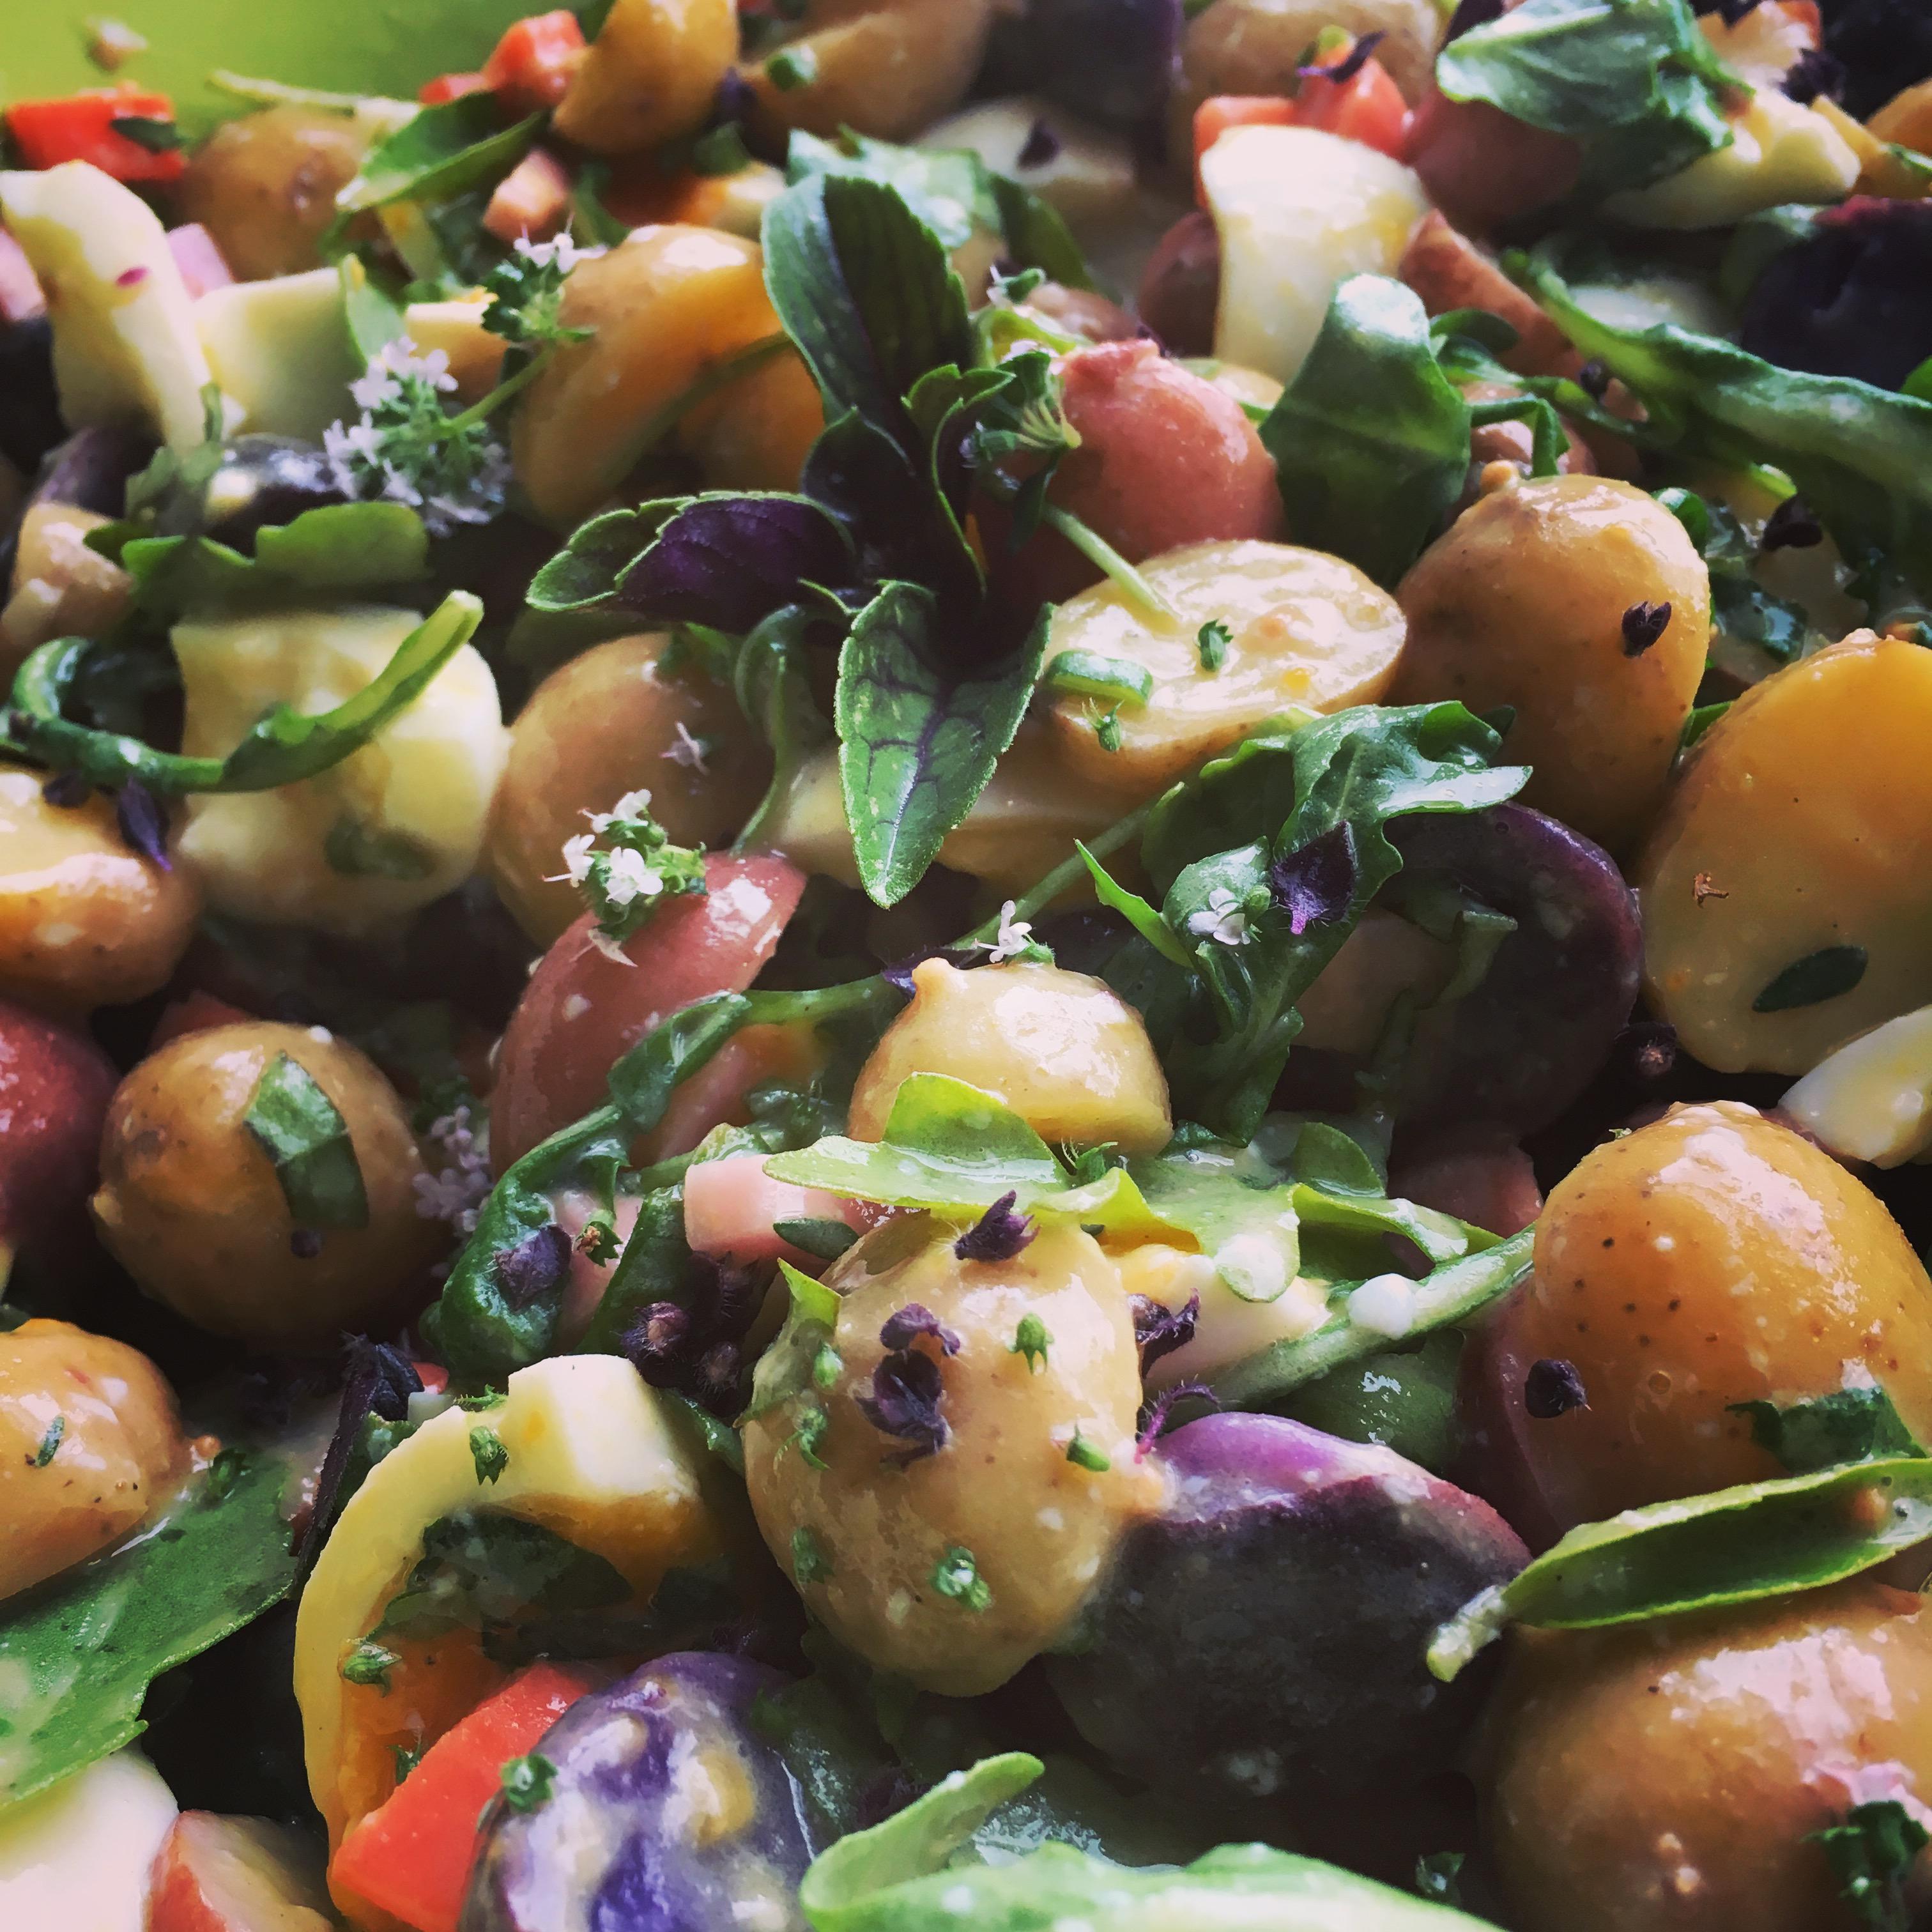 Baby, Tricolored Potatoes make the best potato salad!